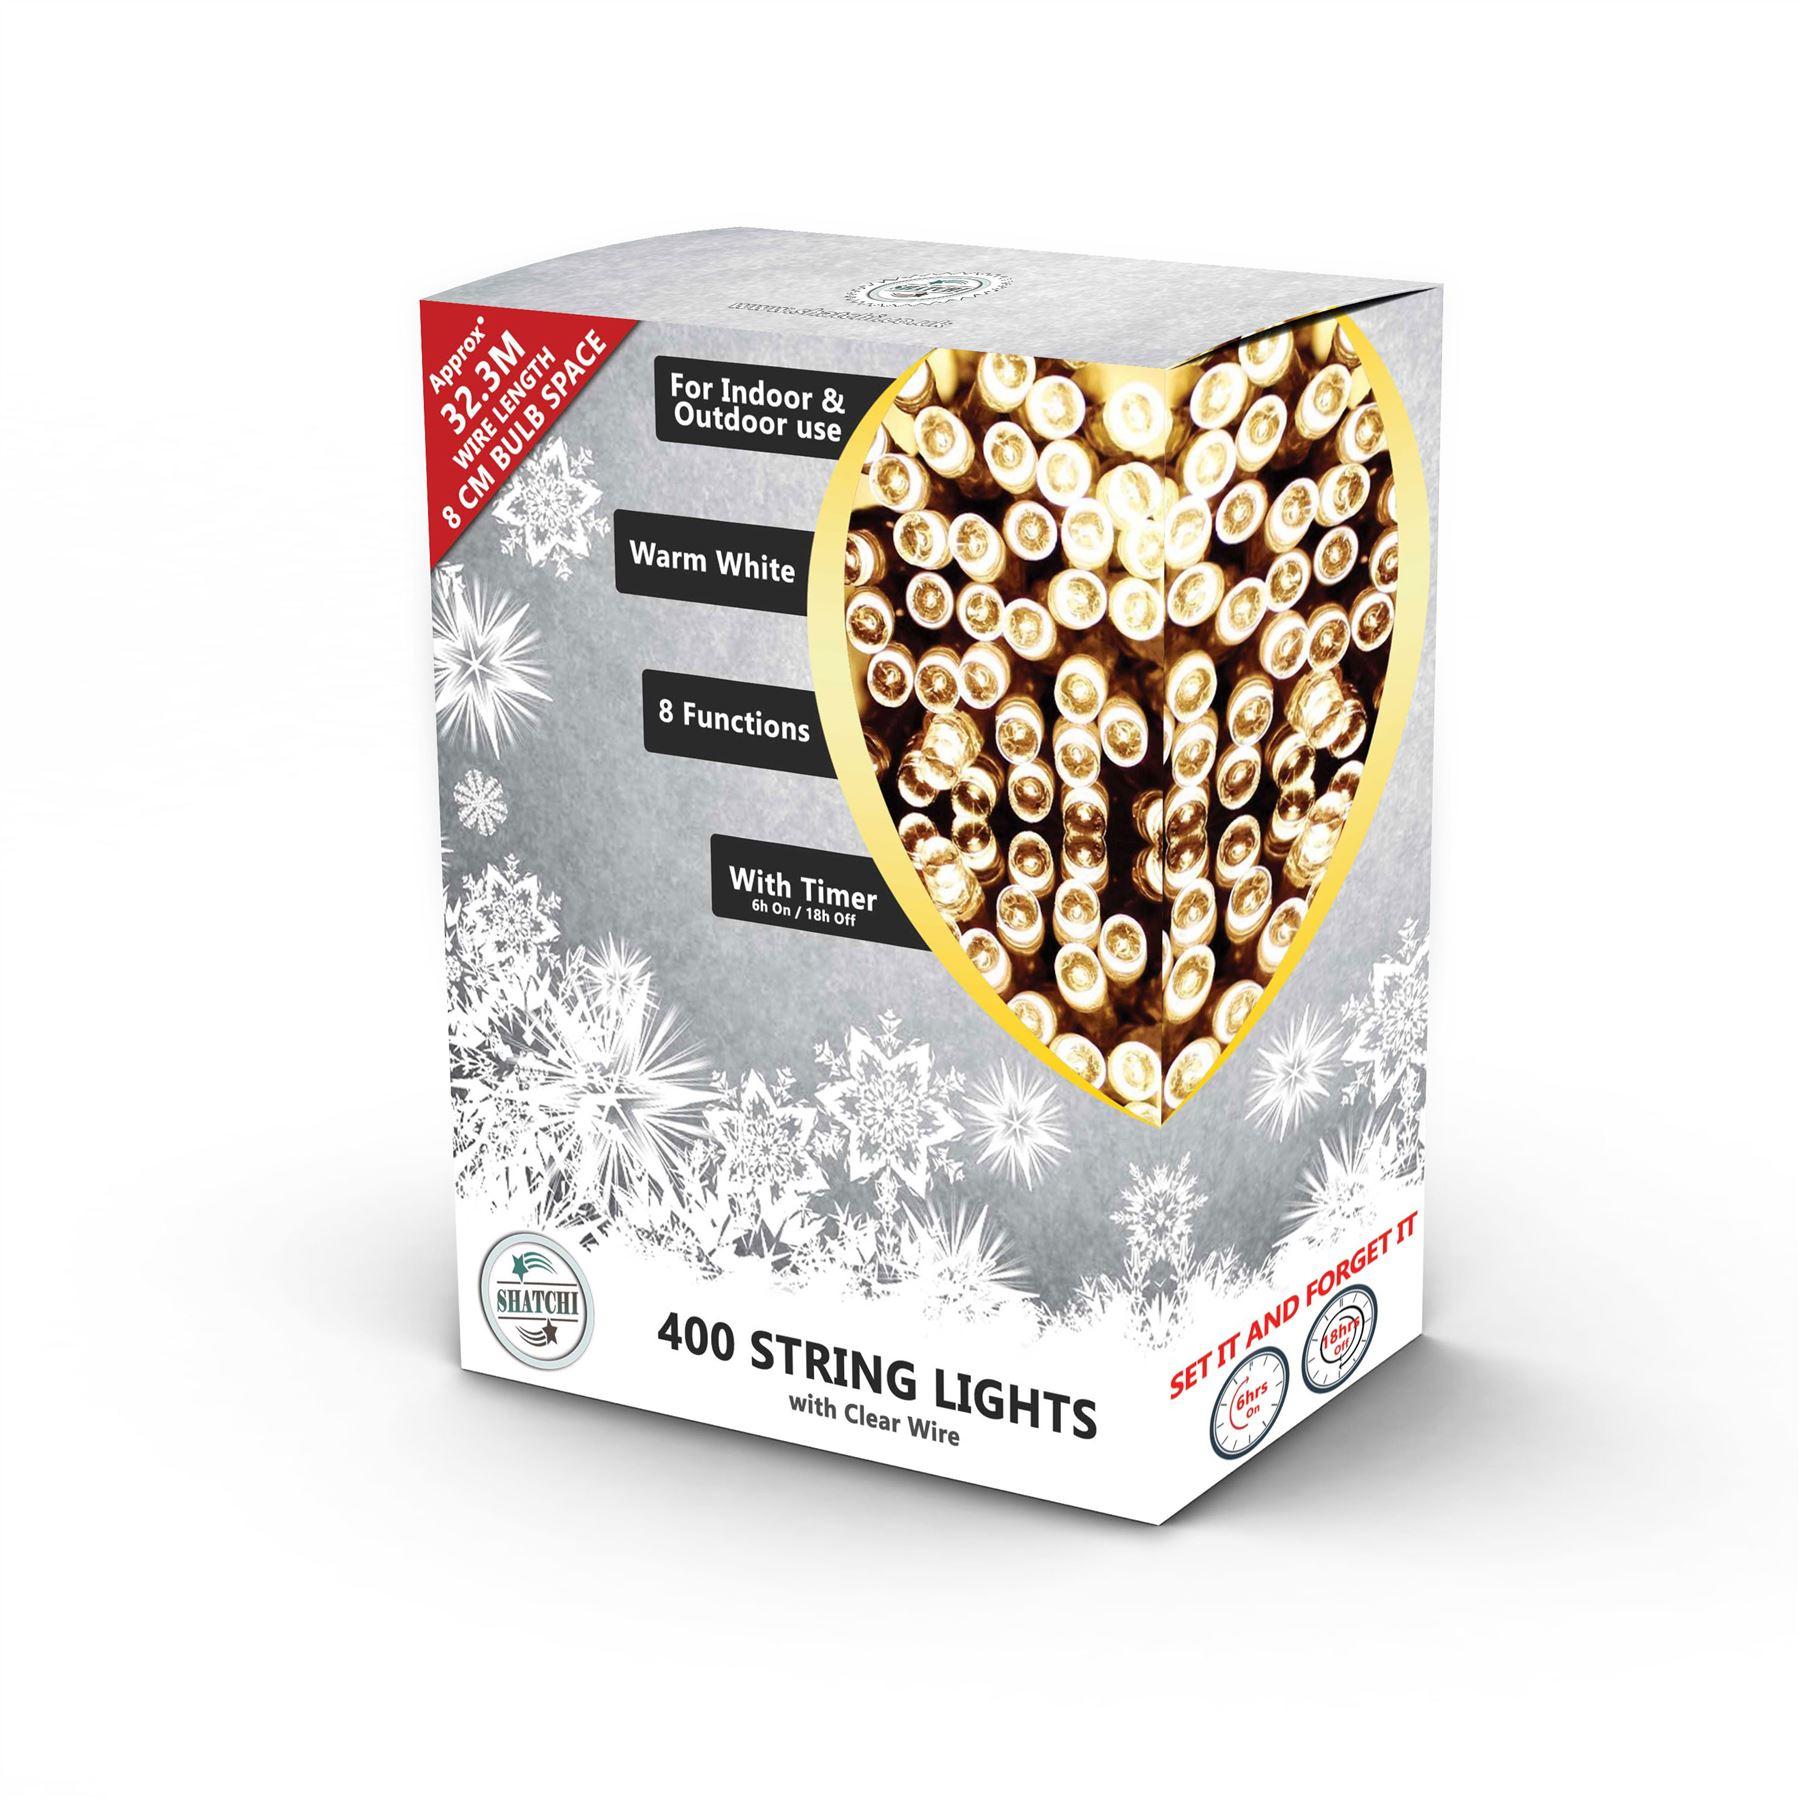 100-200-300-400-500-LED-Christmas-String-Fairy-Lights-Xmas-Decorations-Tree miniature 7